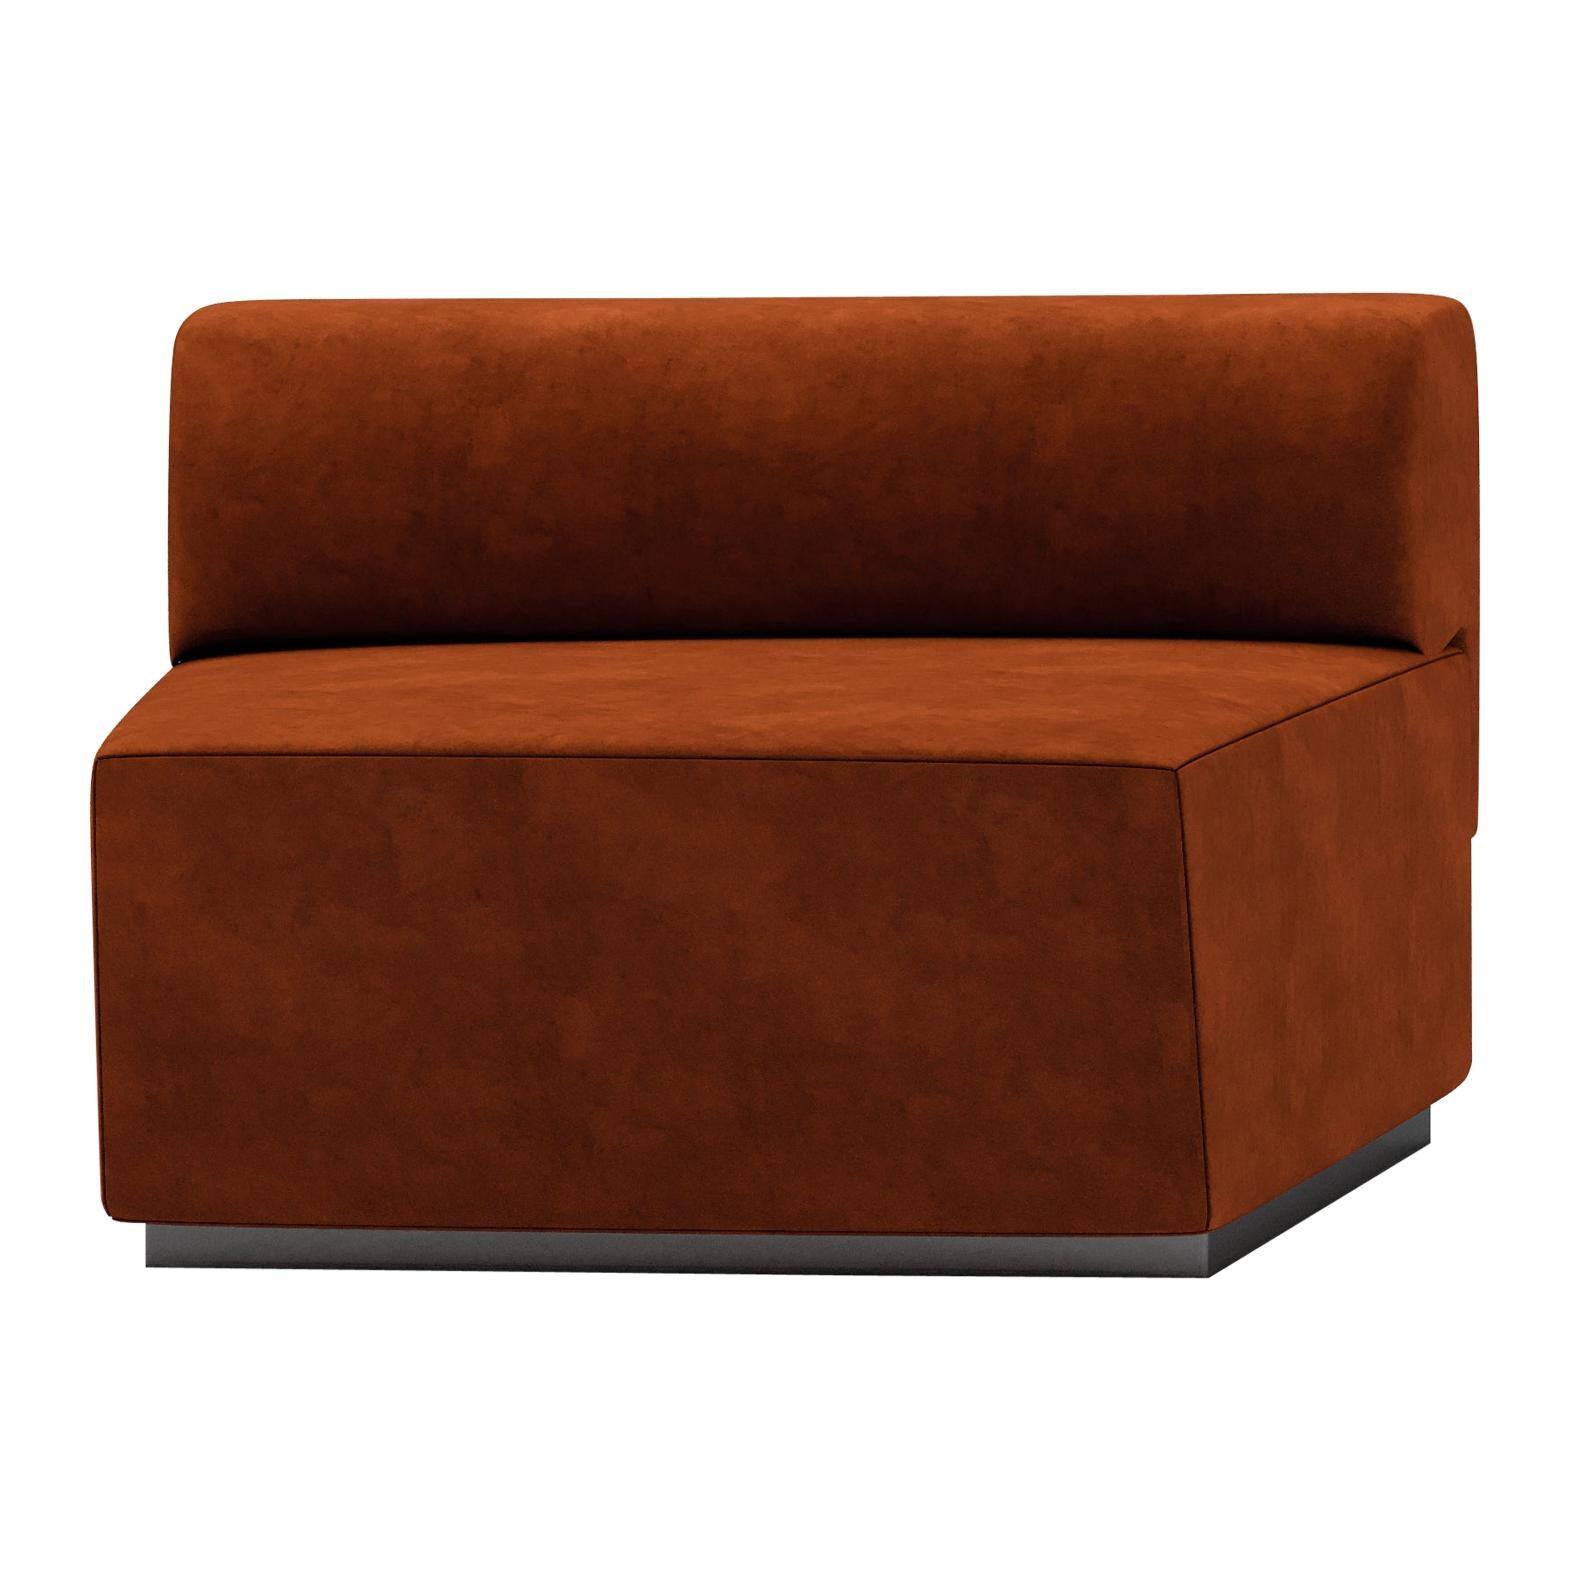 Central Element Contemporary Modular Sofa by Fabio Arcaini Settee Velvet